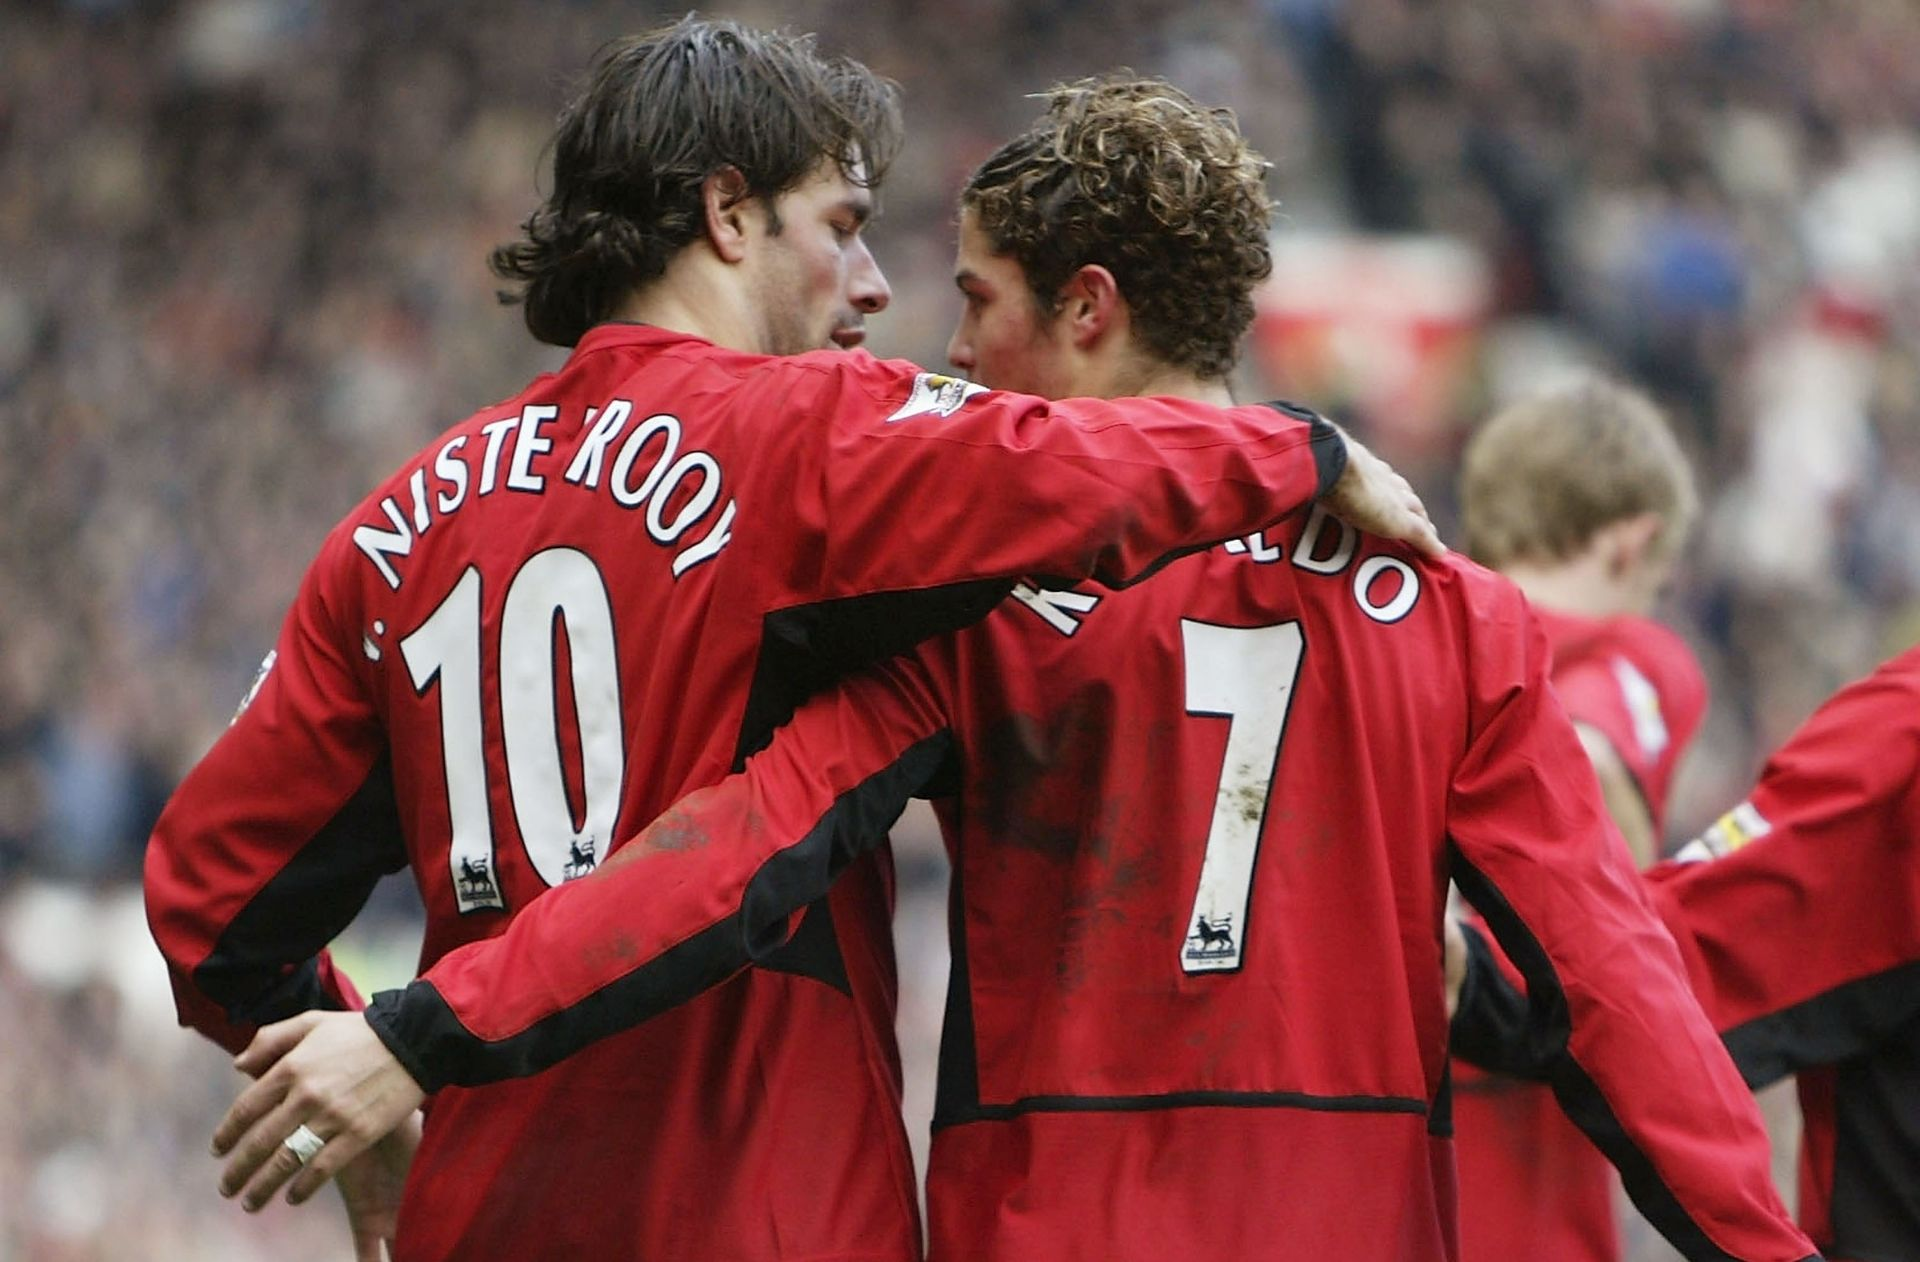 Ruud van Nistelrooy, Cristiano Ronaldo, Manchester United